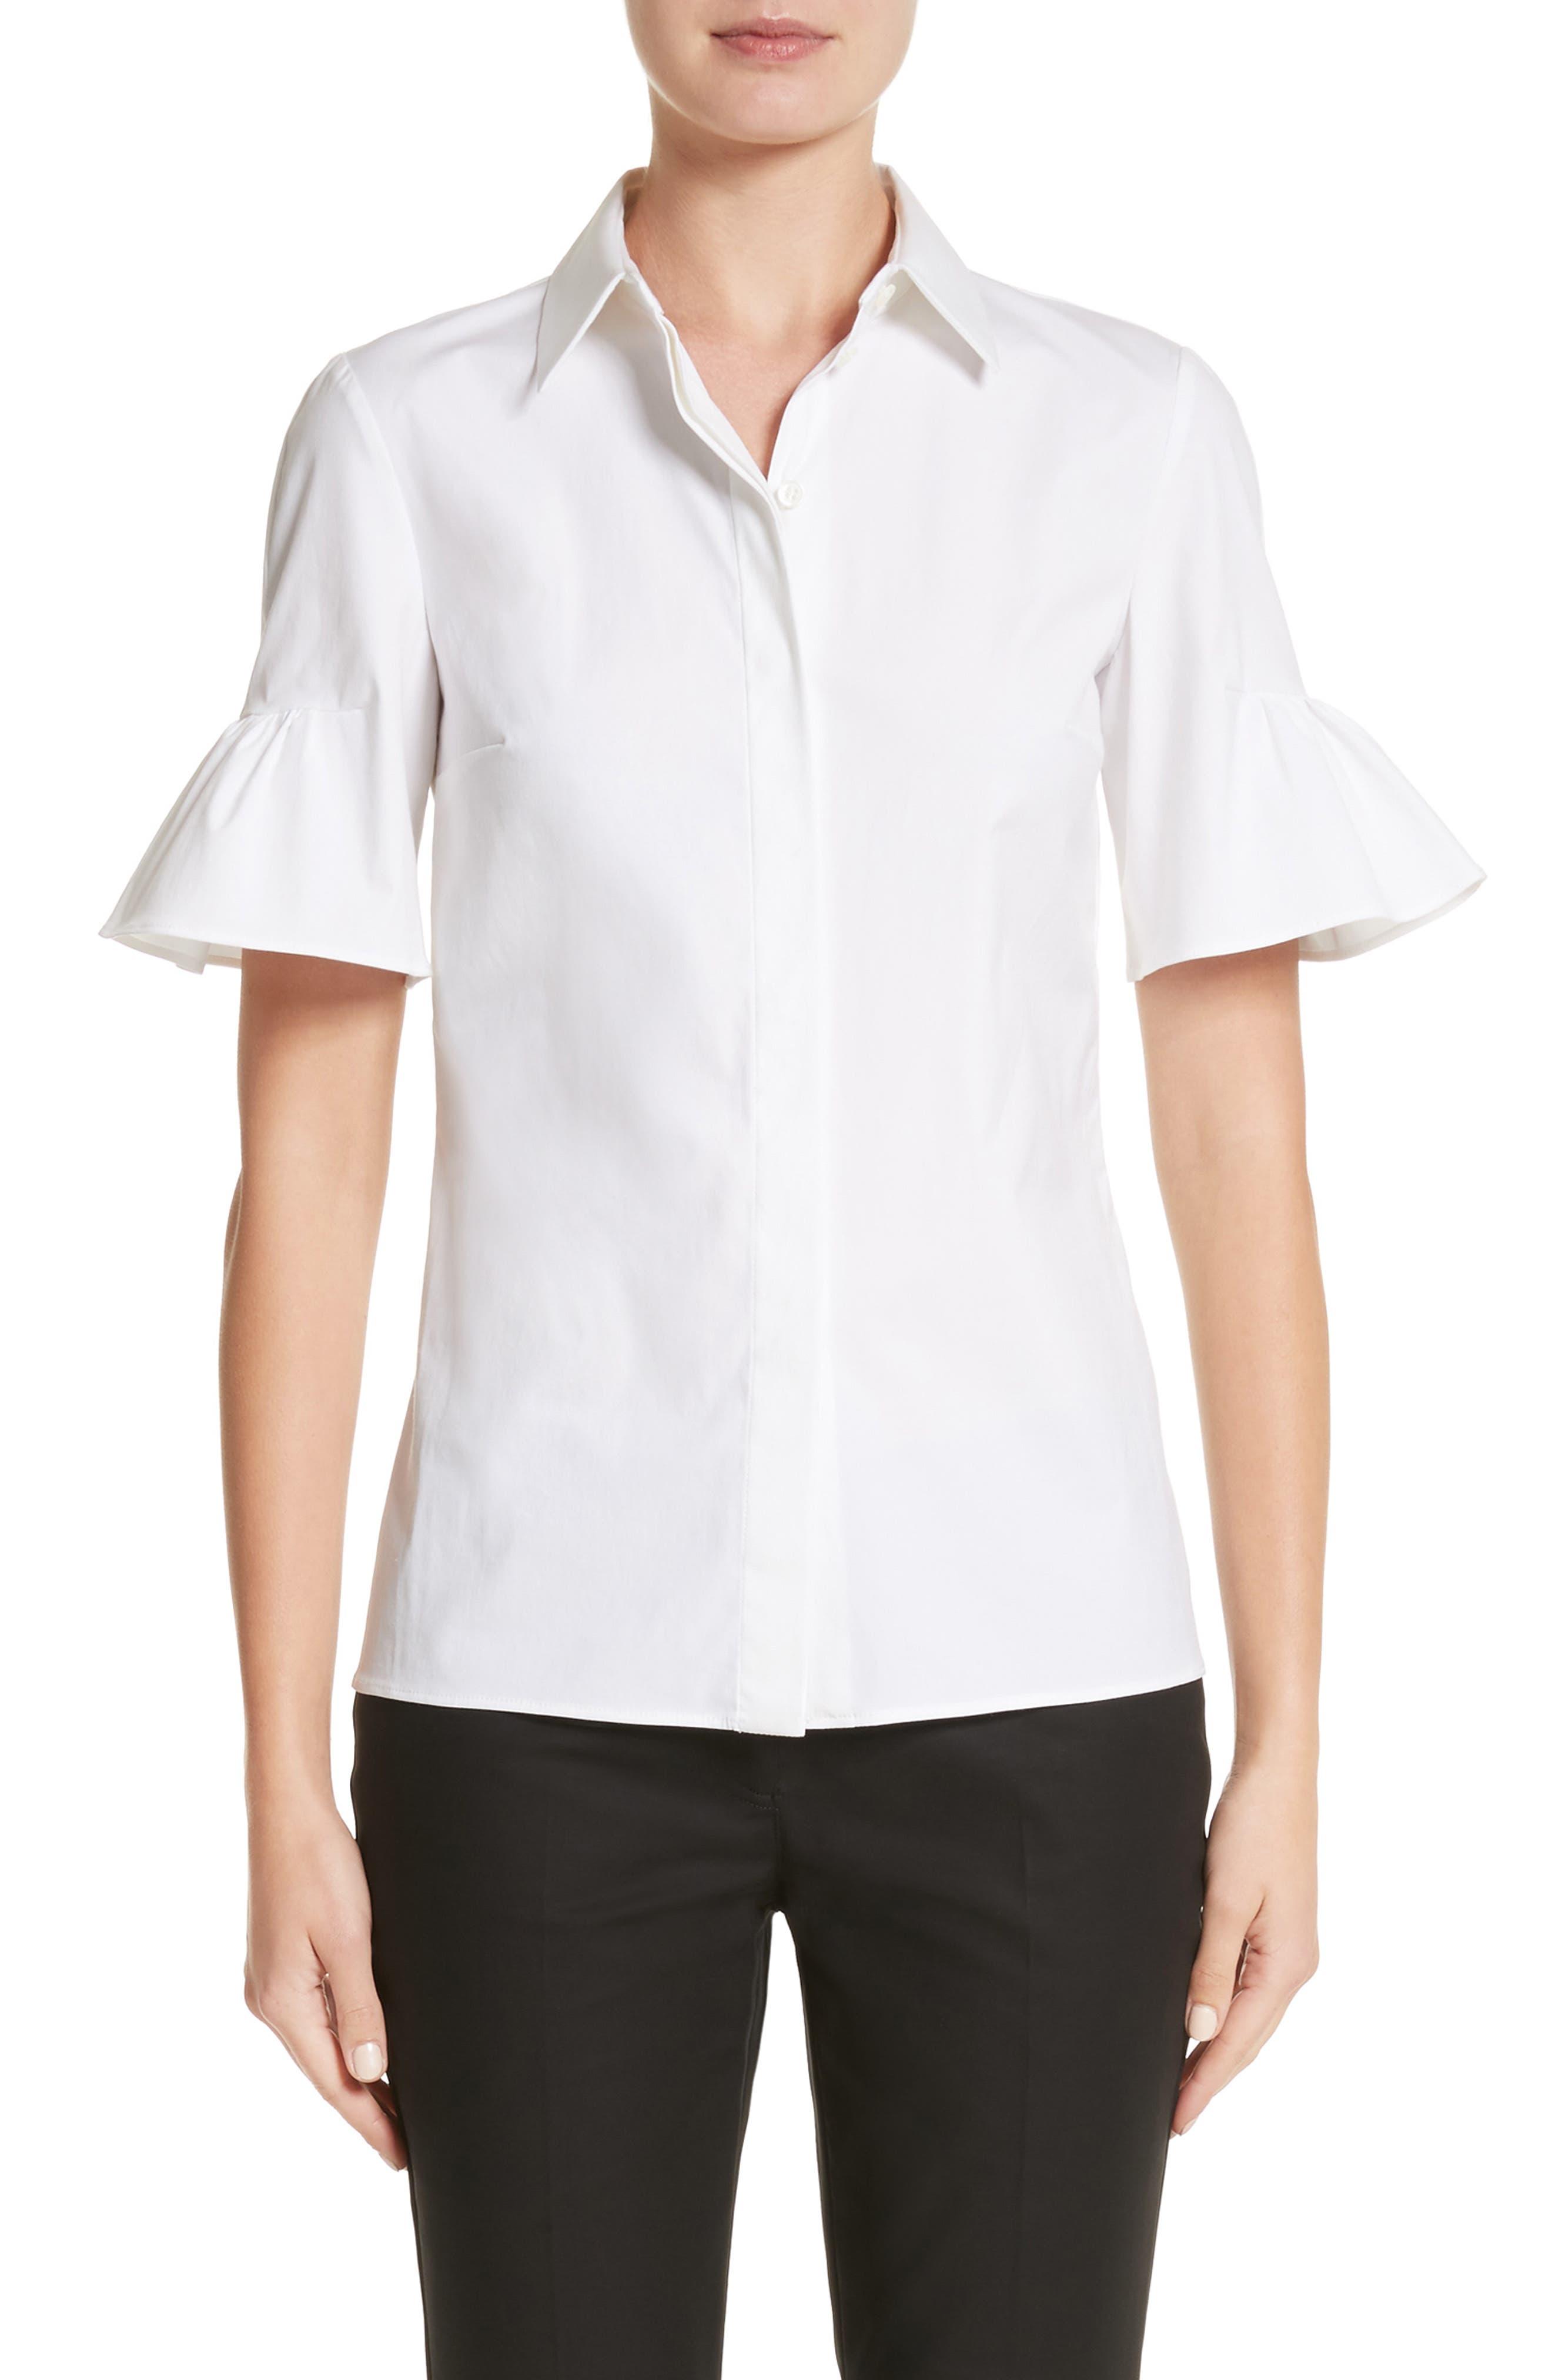 Alternate Image 1 Selected - Michael Kors Bell Sleeve Shirt